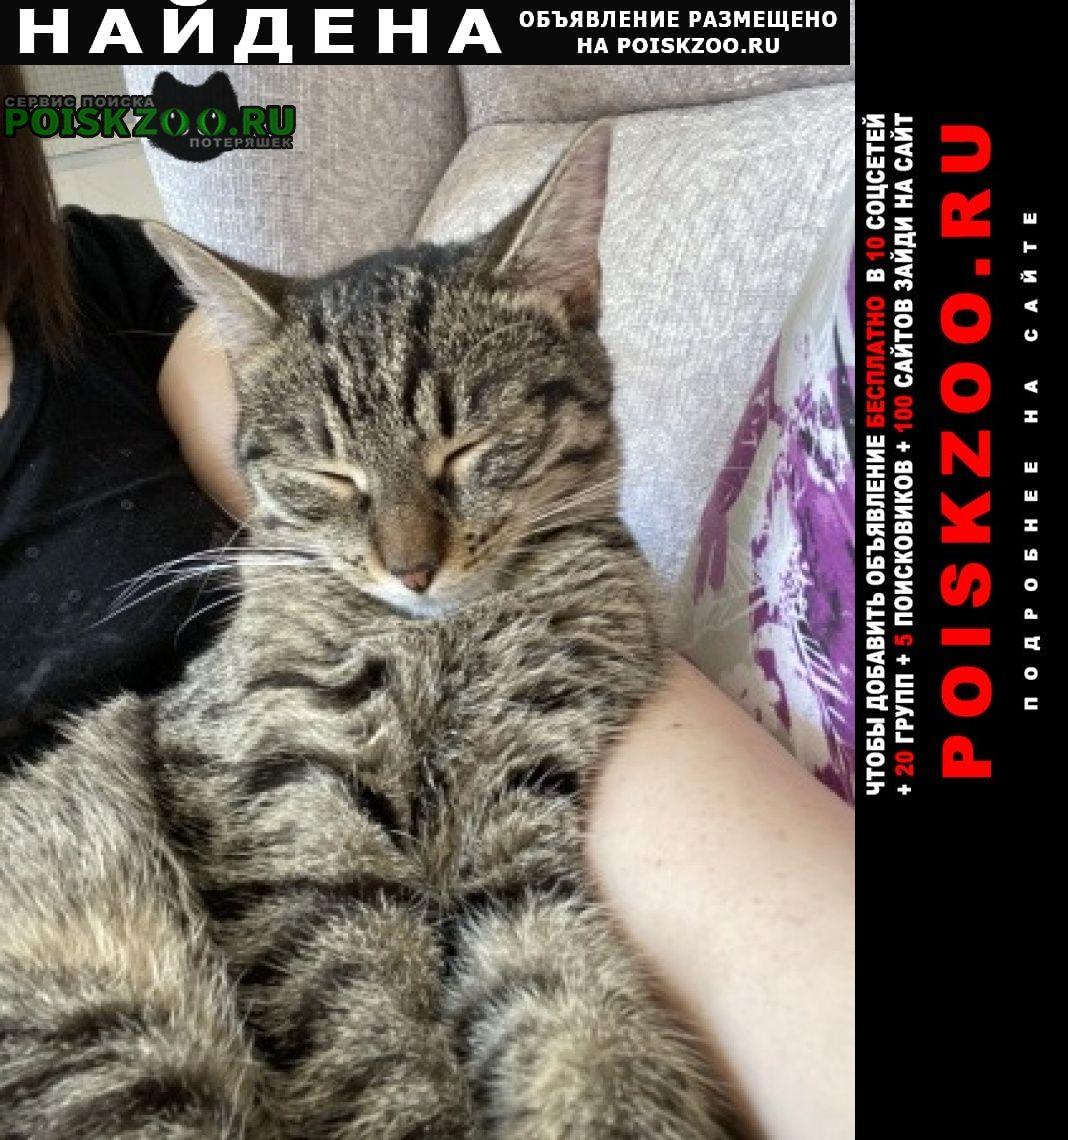 Москва Найдена кошка молодая кошечка